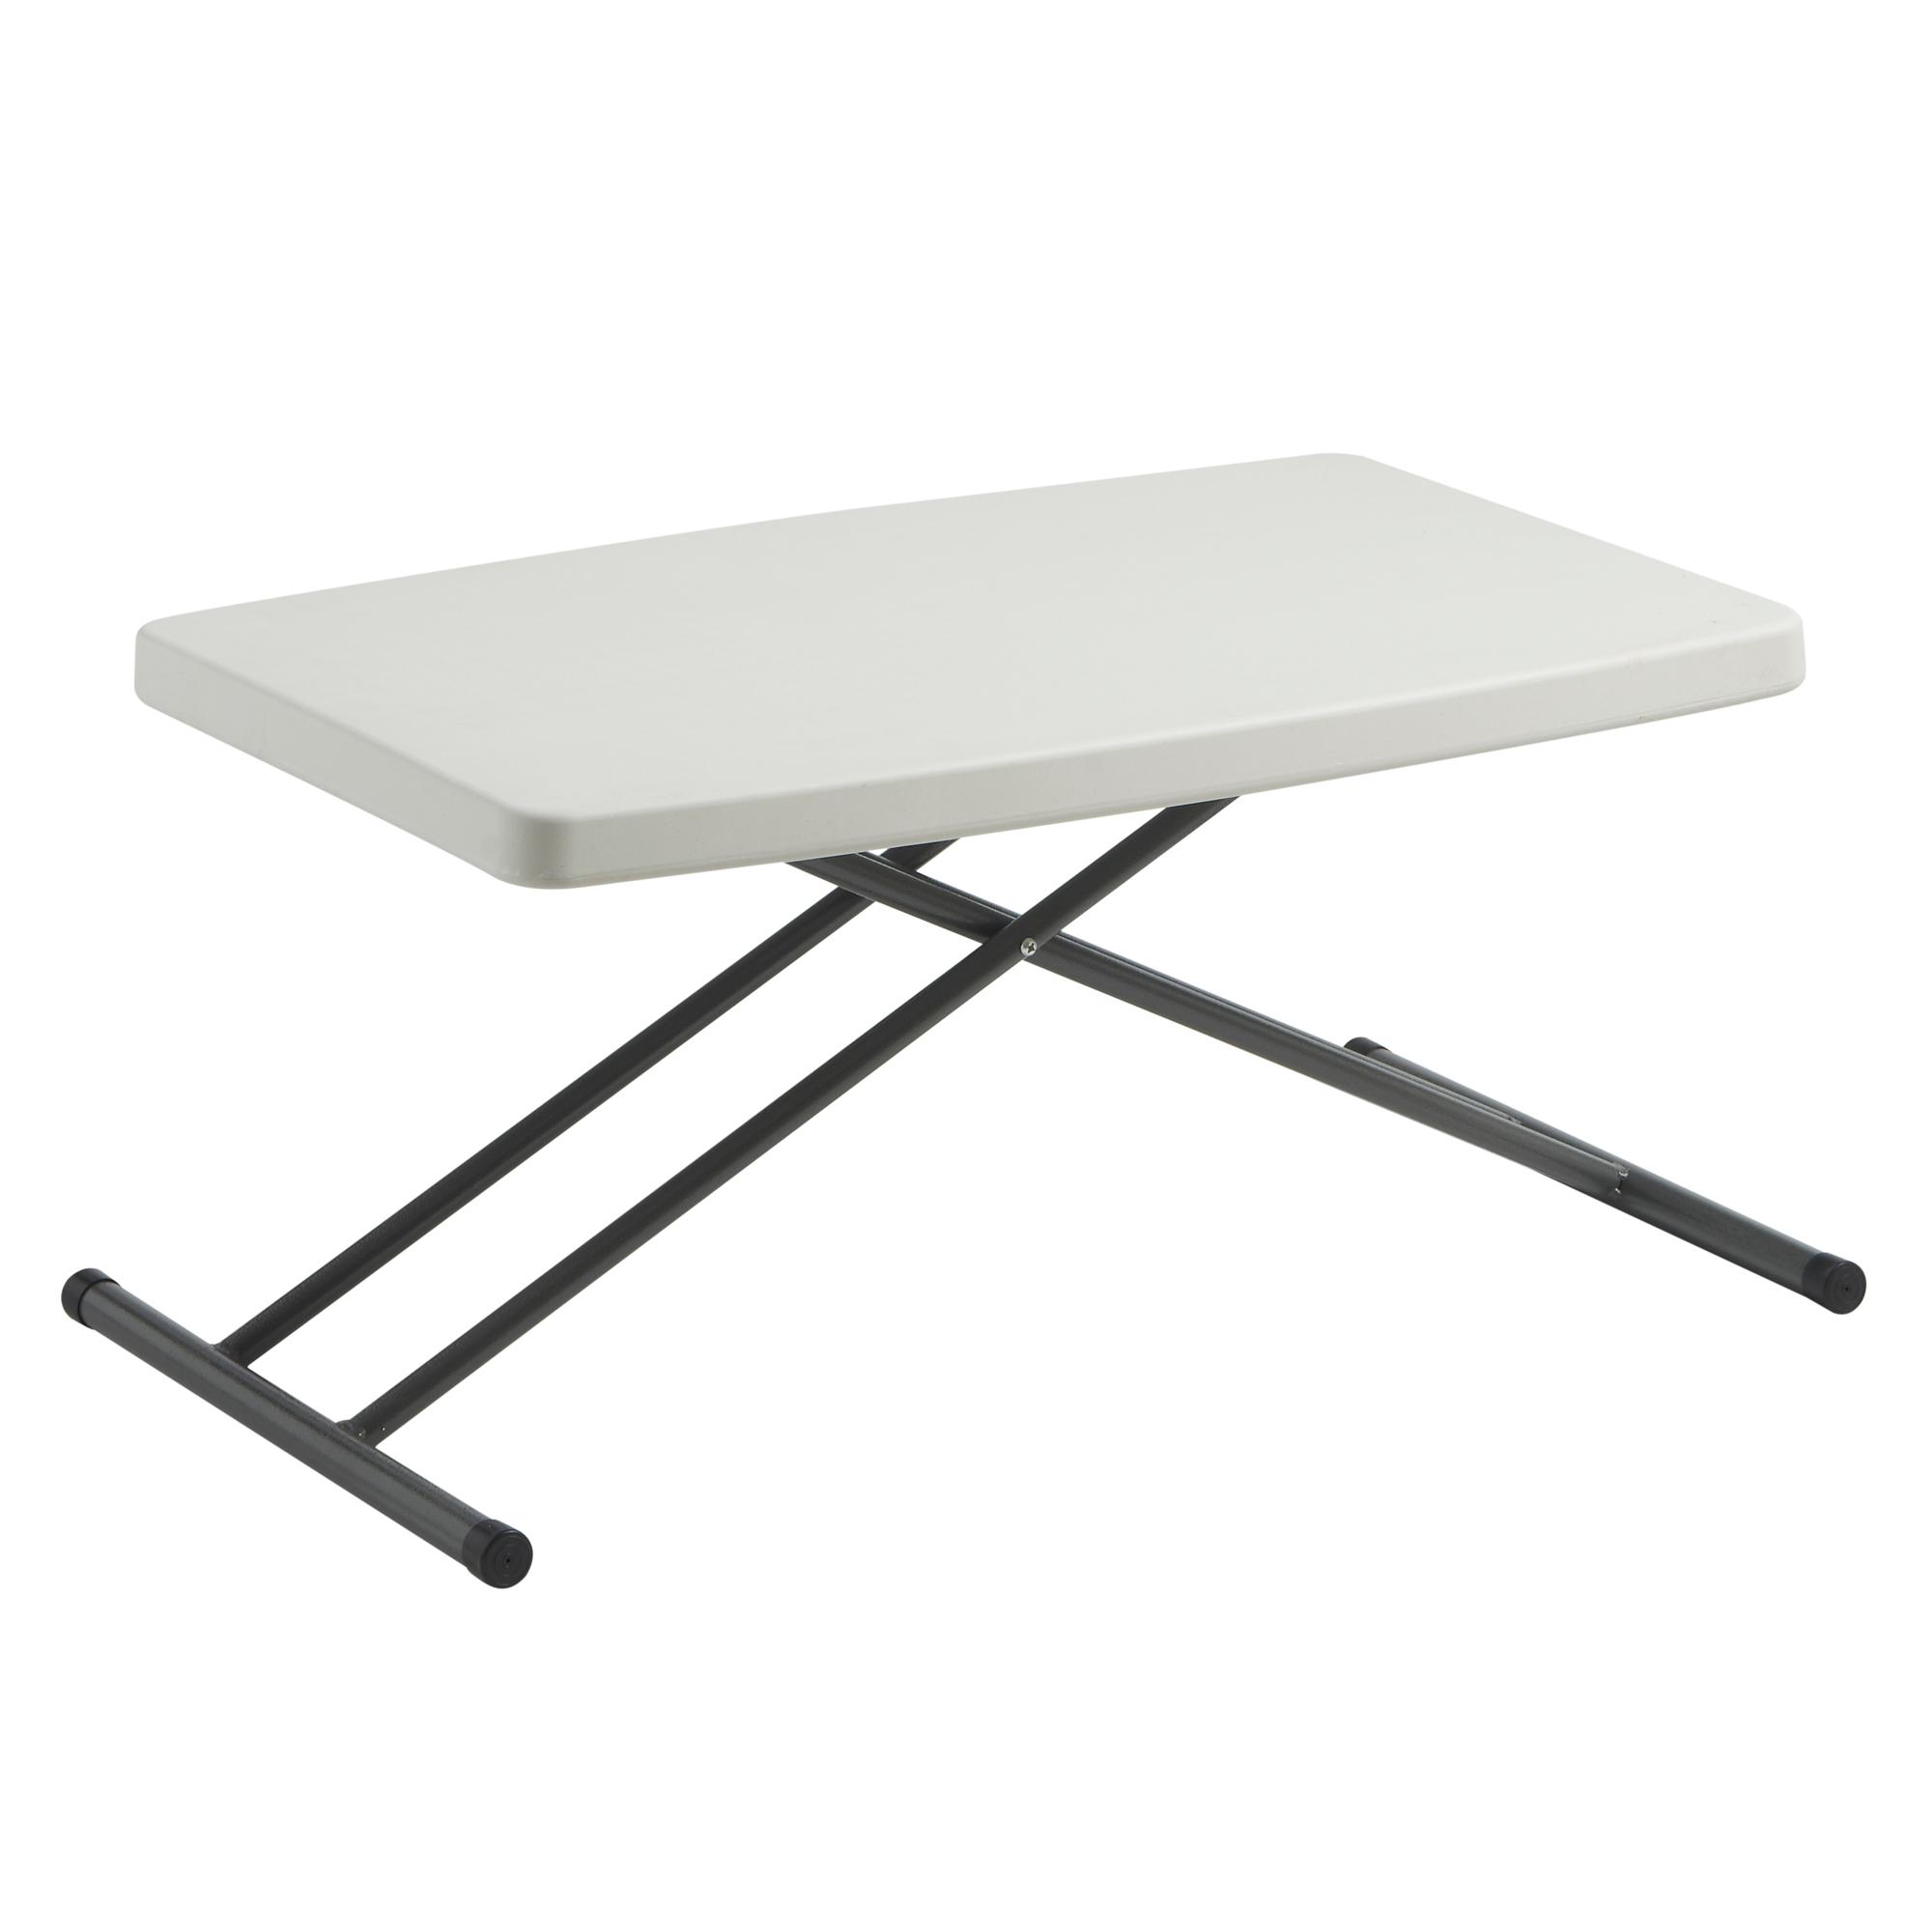 Sentinel VonHaus 2.5ft (0.77m) Adjustable Height Folding Trestle Table